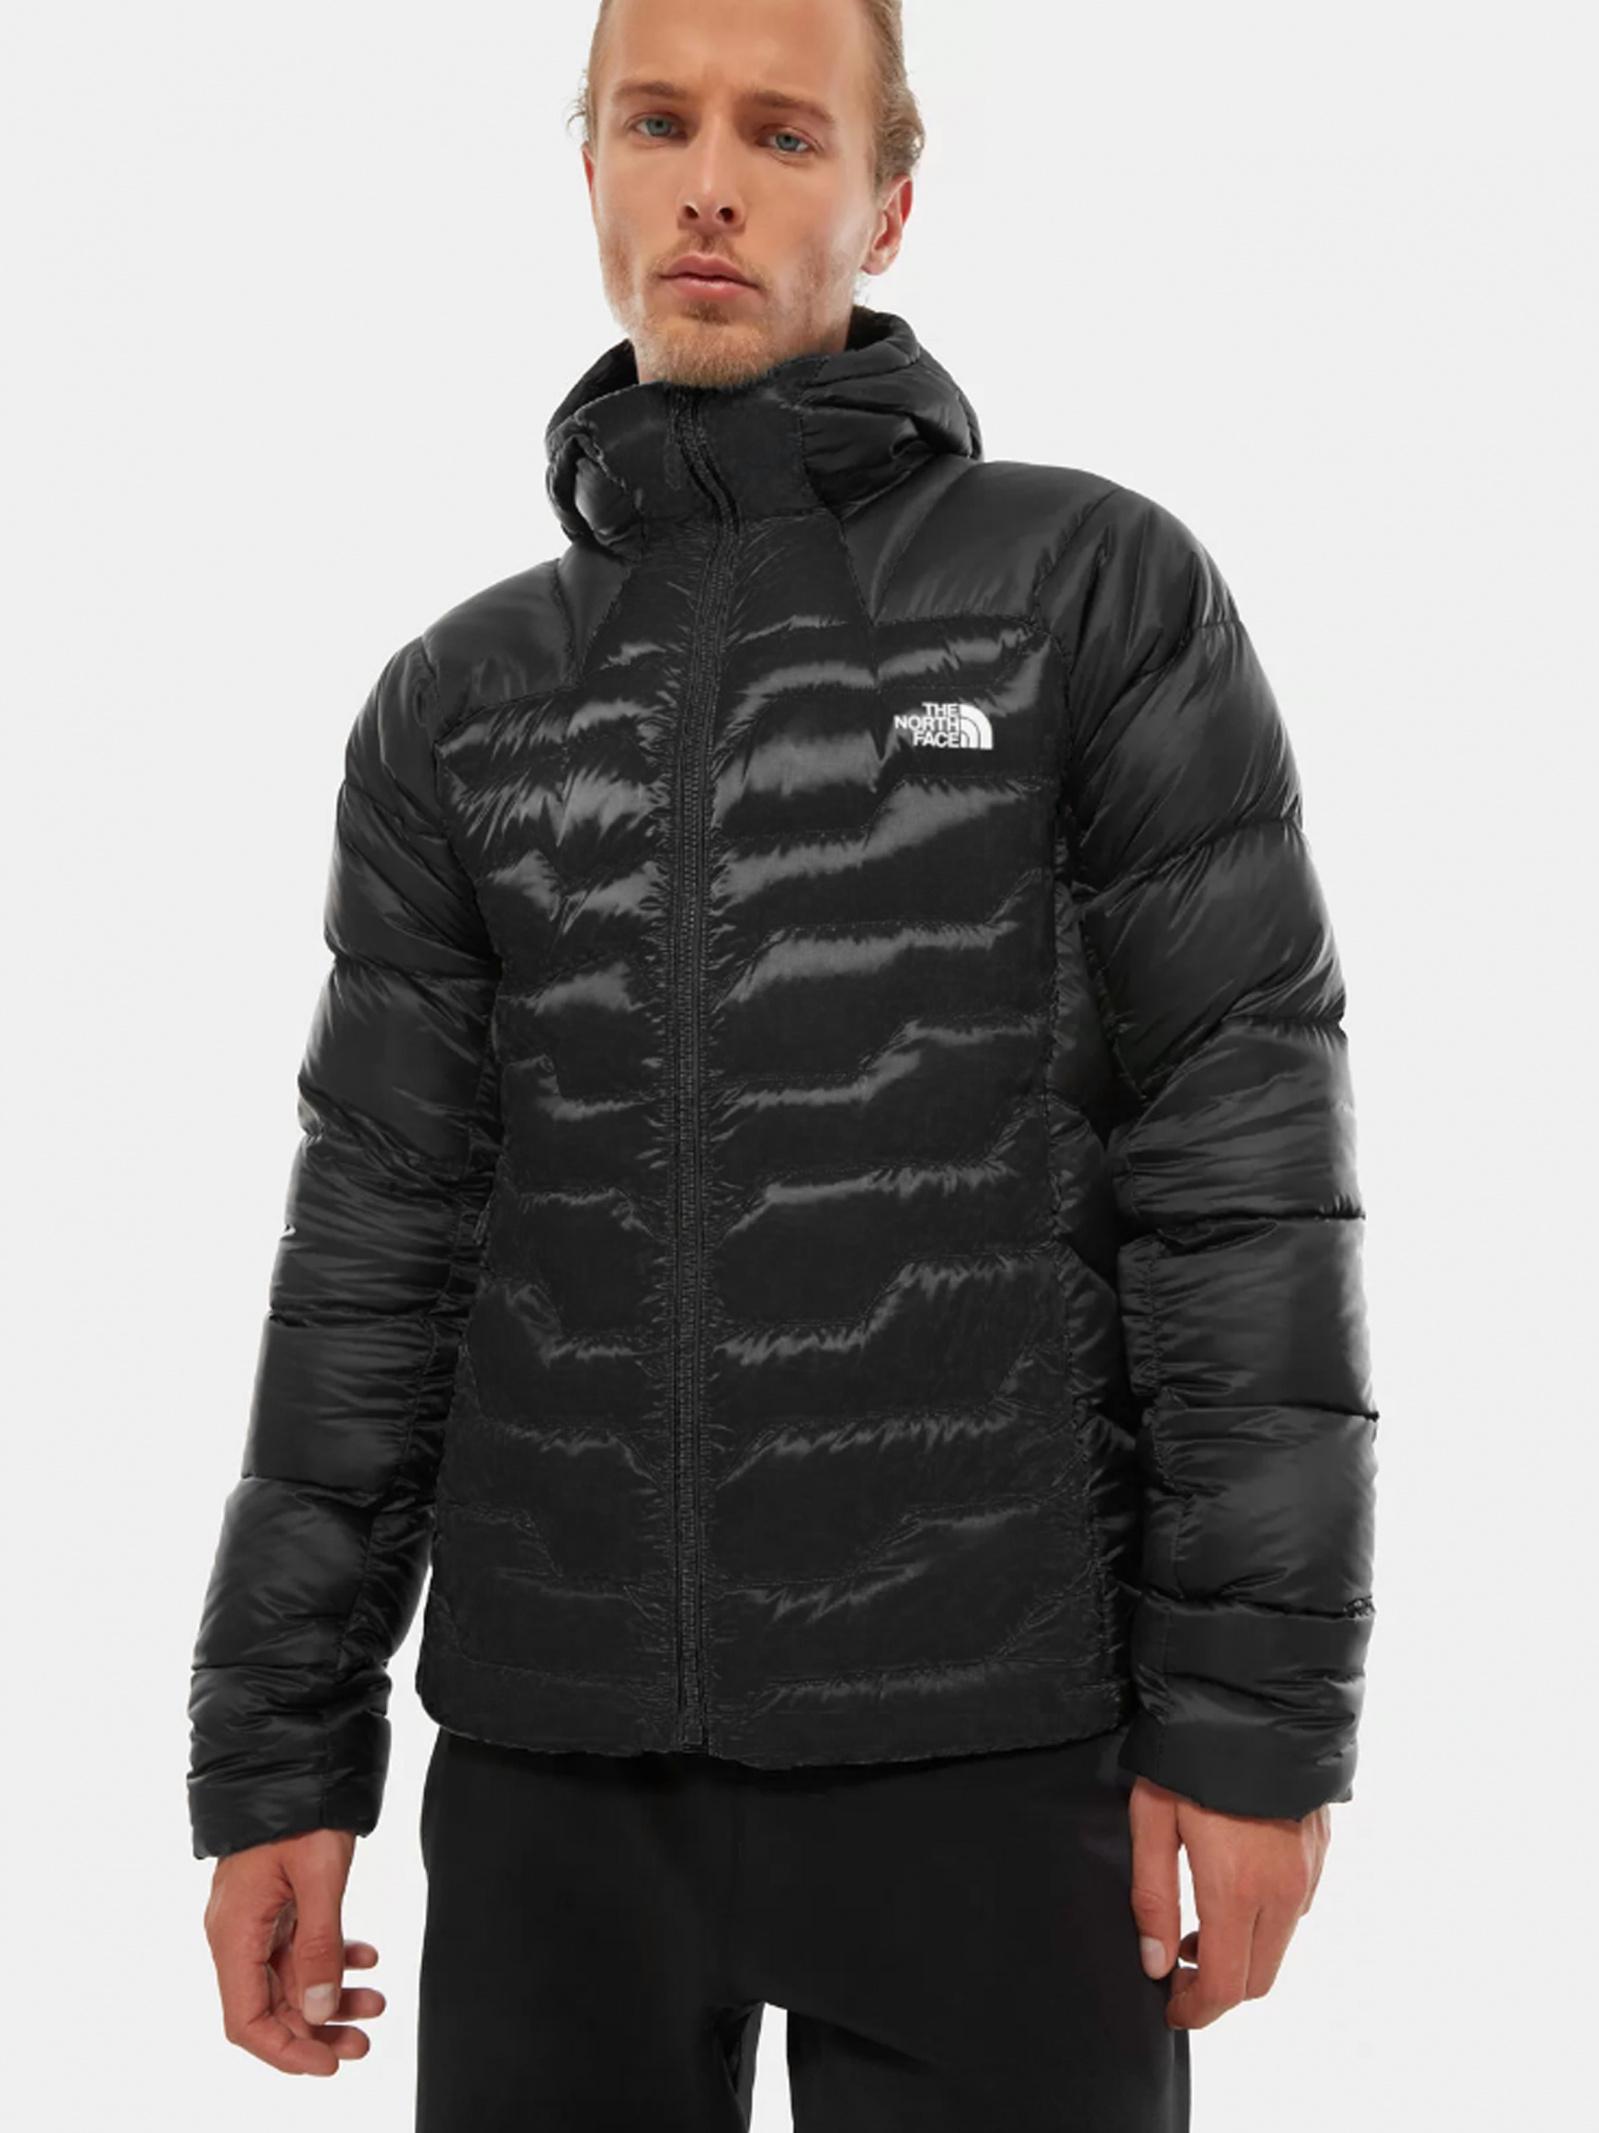 Куртка чоловіча The North Face модель NF0A3YEW1ZV1 - фото